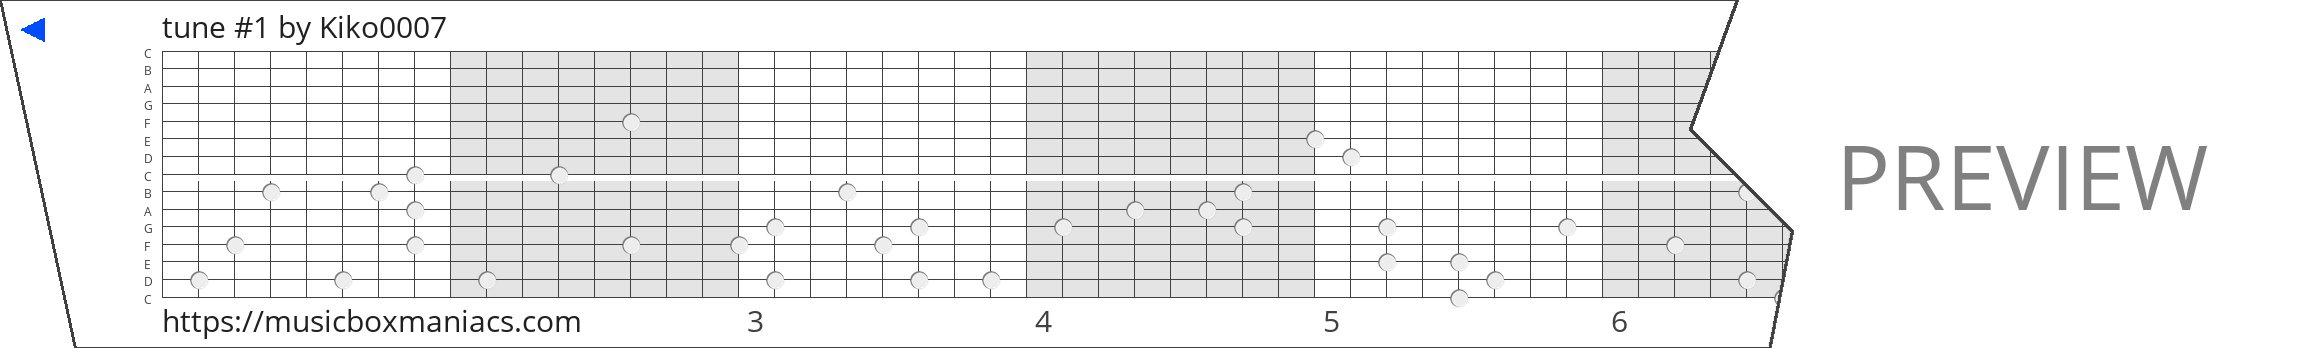 tune #1 15 note music box paper strip